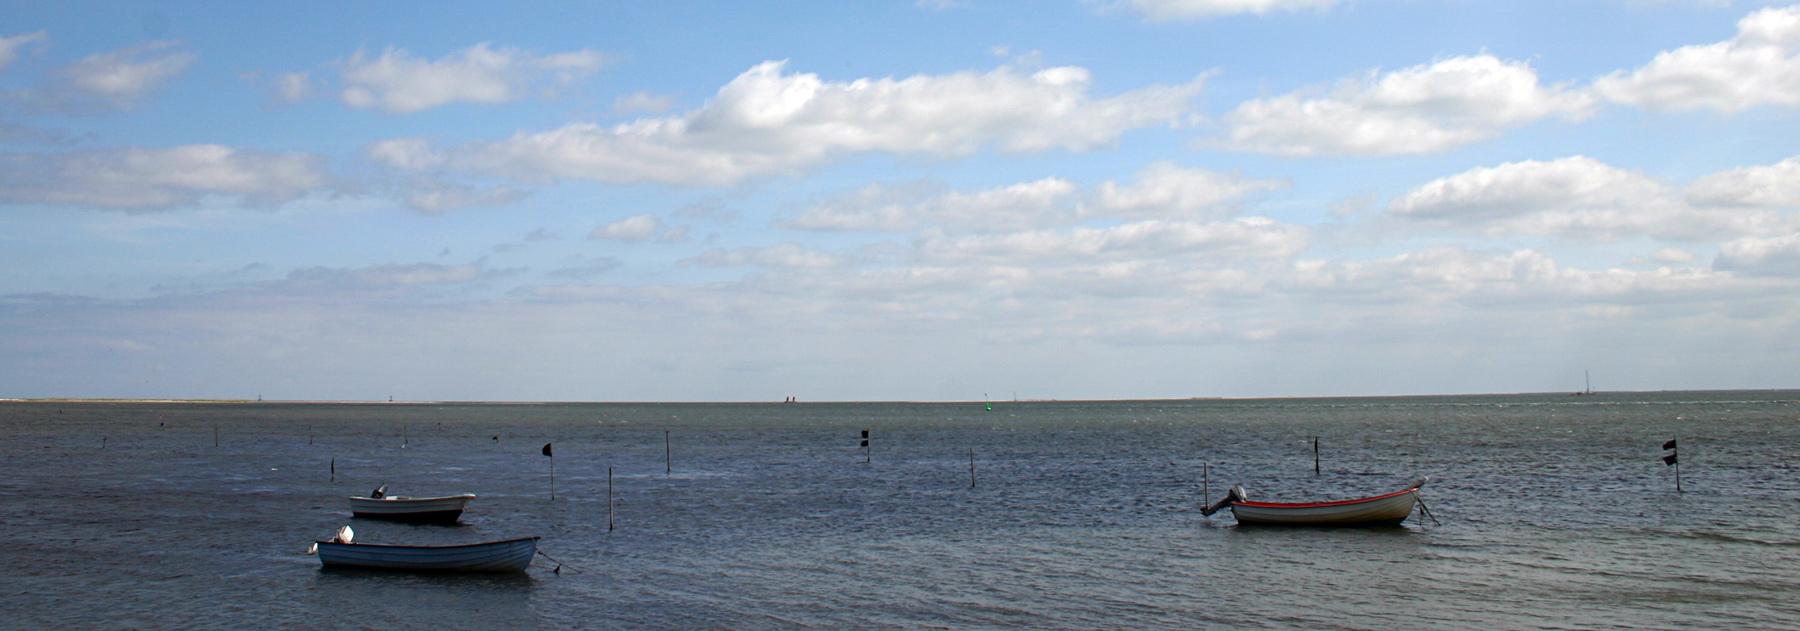 Small boats on sea, Boats, Empty, Engine, Harbor, HQ Photo